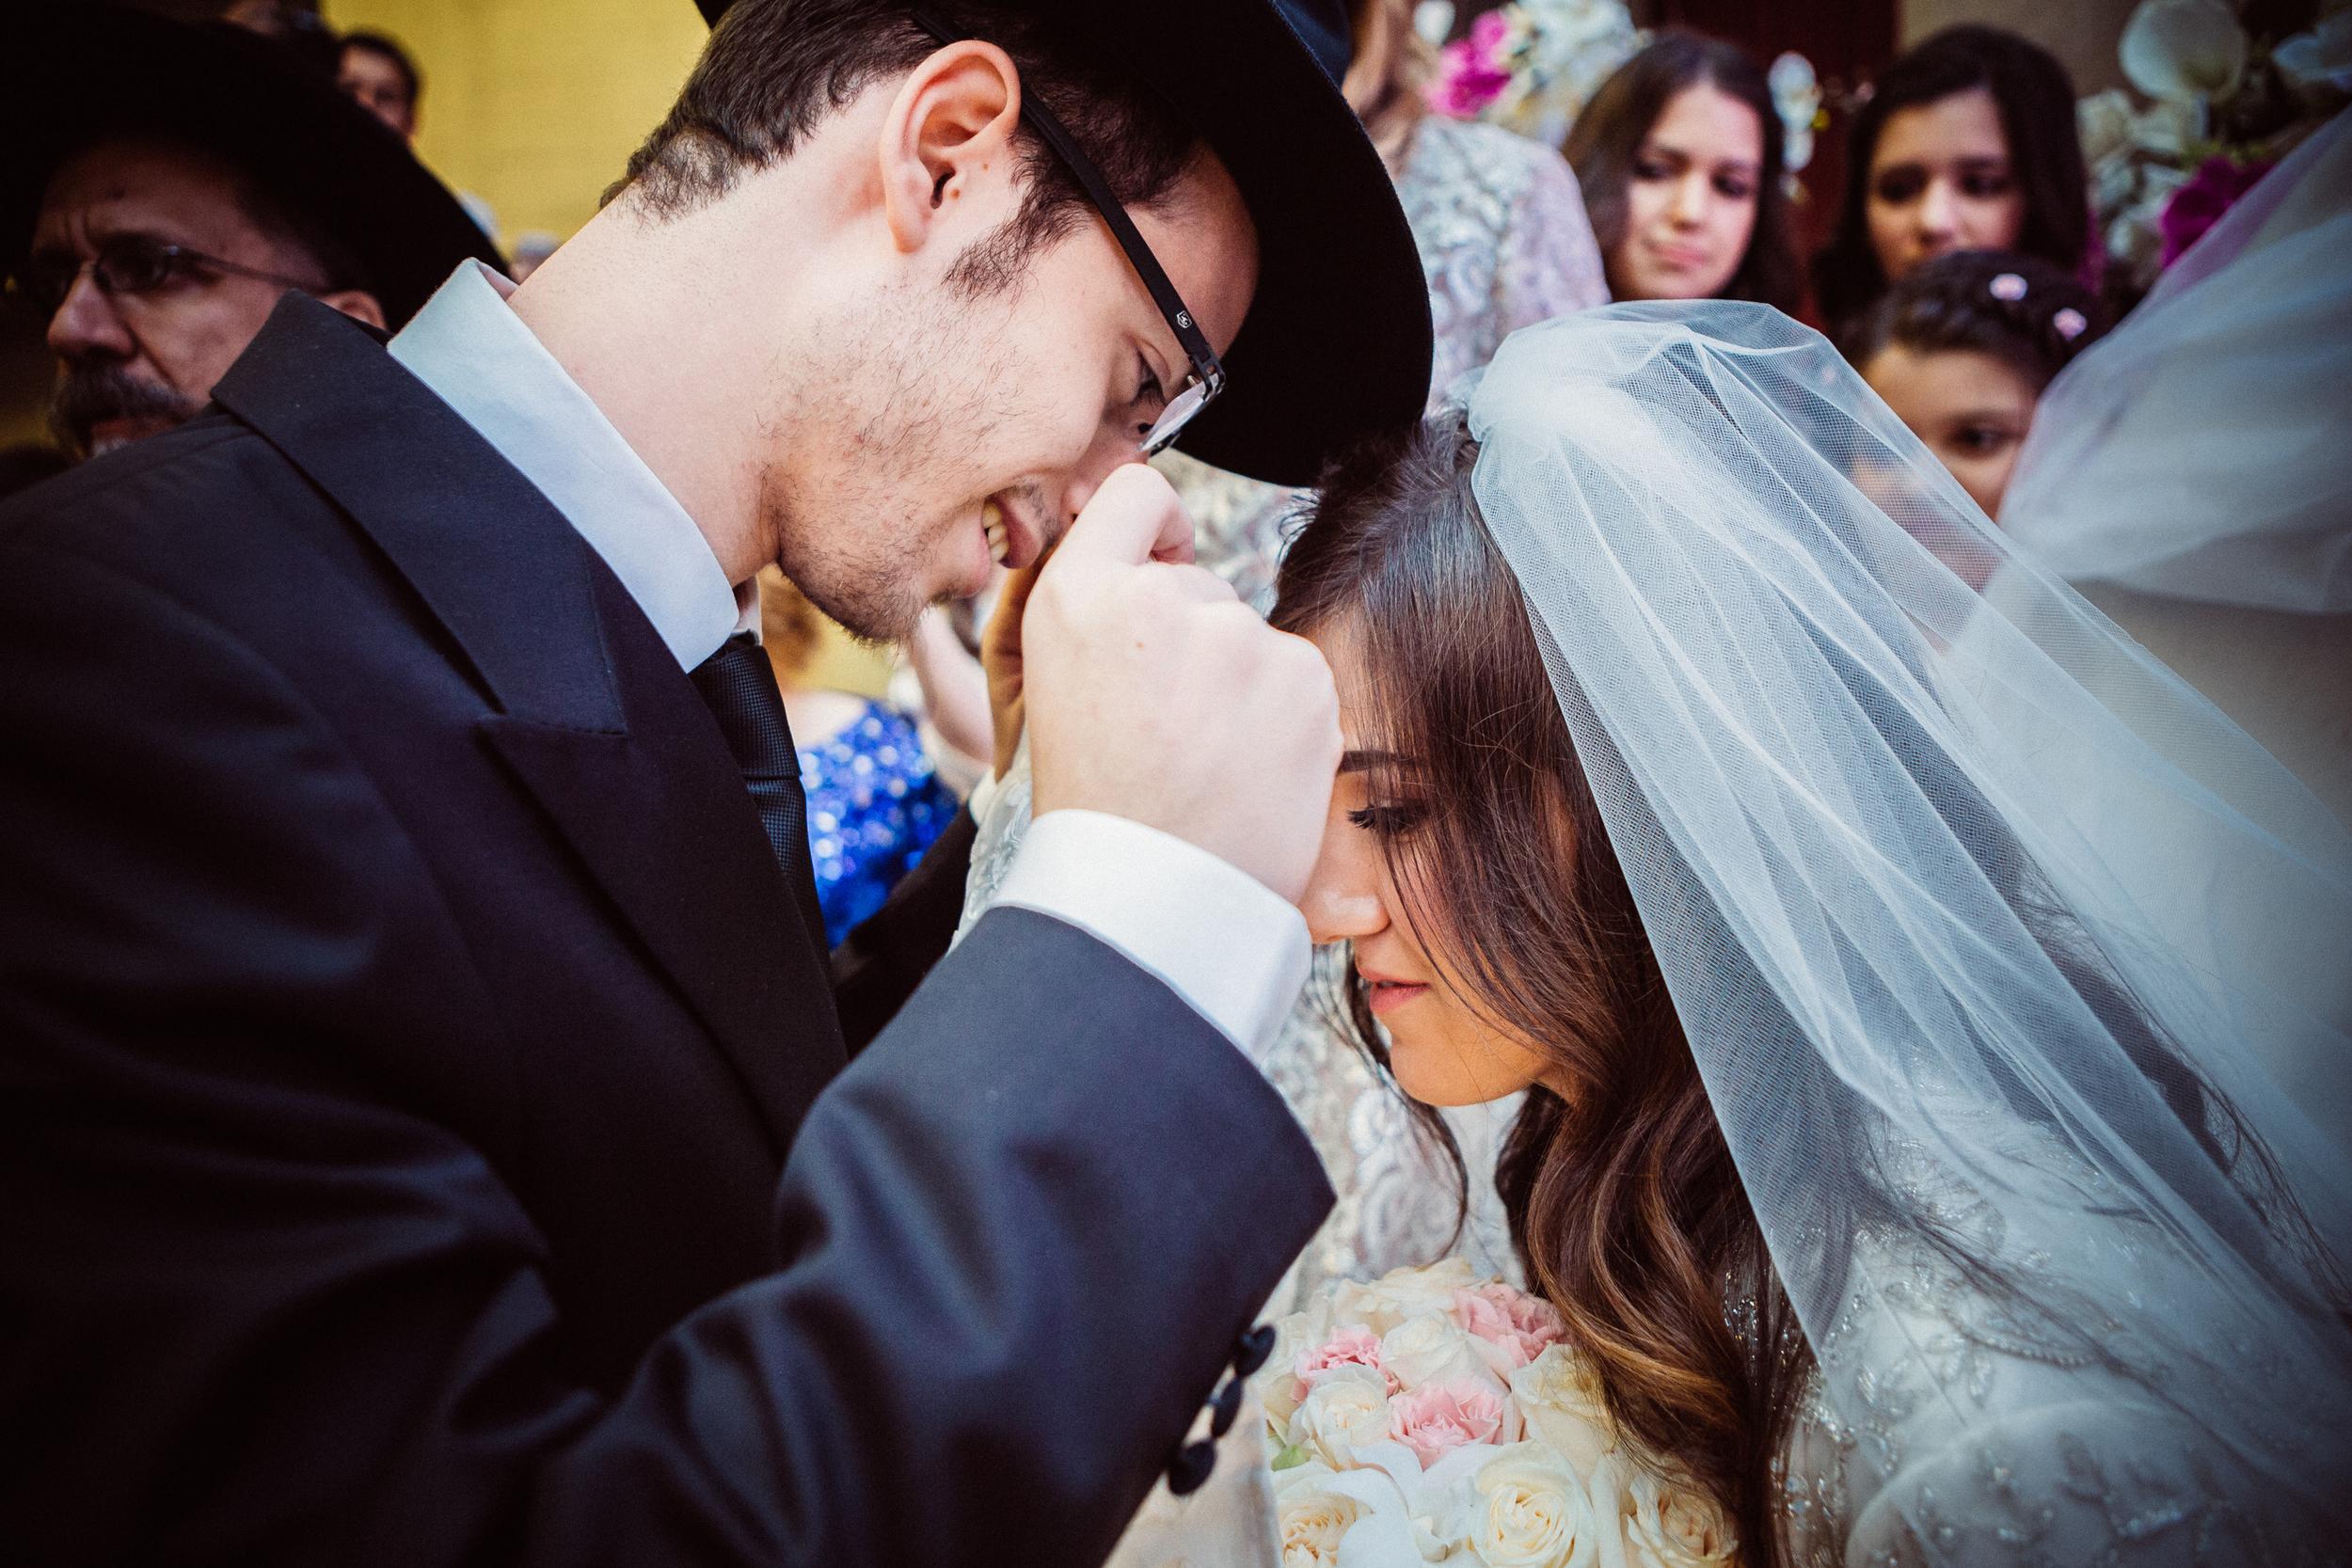 Wedding Iossi and Gitty Khafif  - Eliau Piha studio photography, new york, events, people 770 brooklyn -0323.jpg